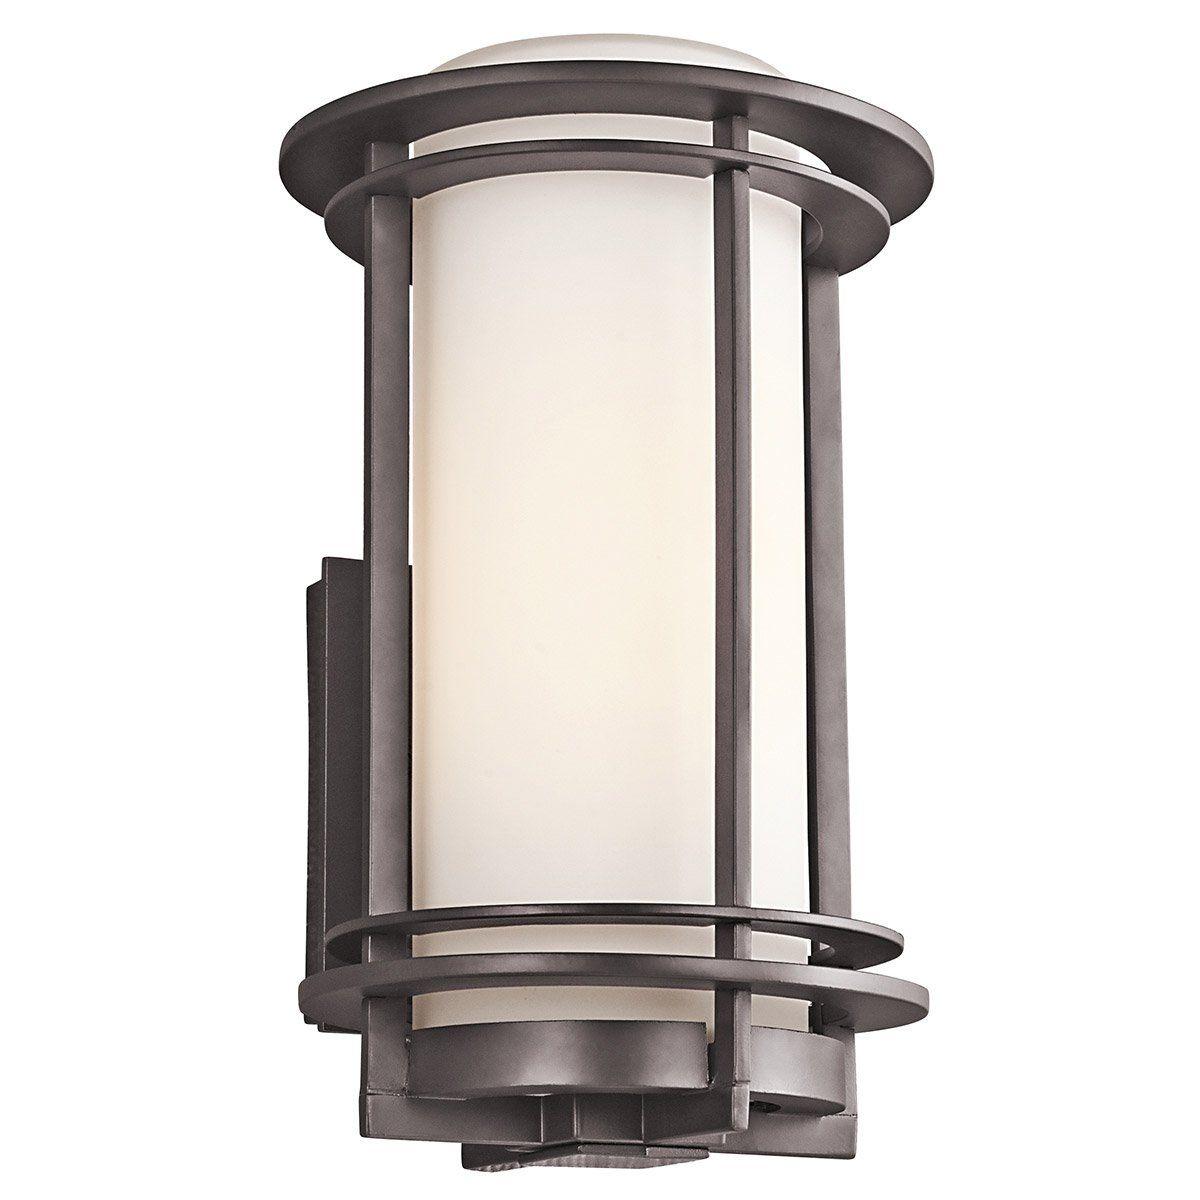 ff1078febb8 Kichler Lighting 49345AZFL Pacific Edge 1 Light 13 inch Architectural Bronze  Outdoor Wall Mount in Fluorescent